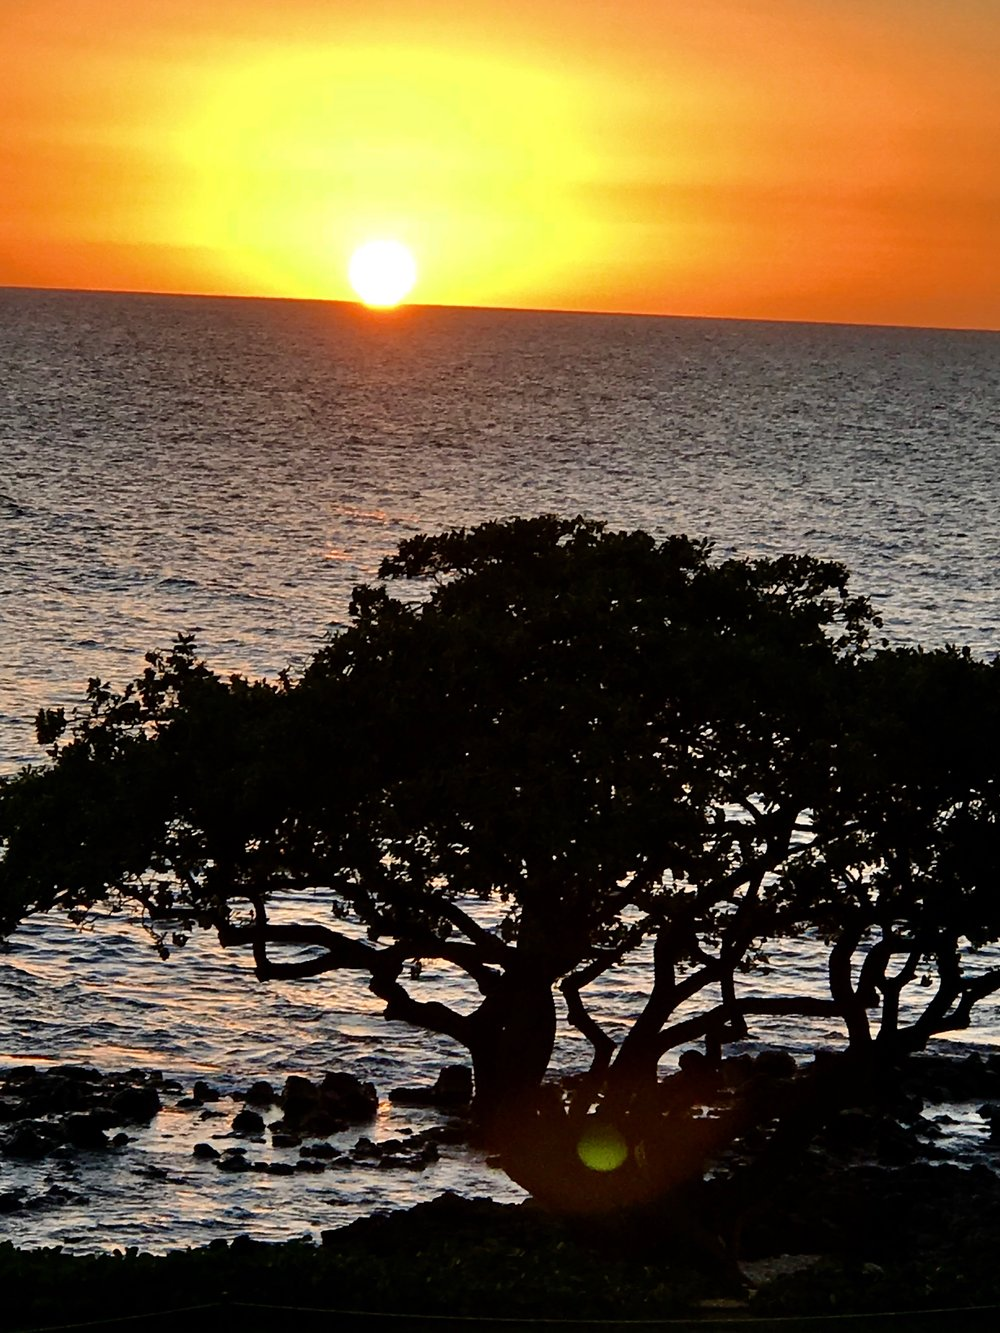 Sunset w tree 3.jpg